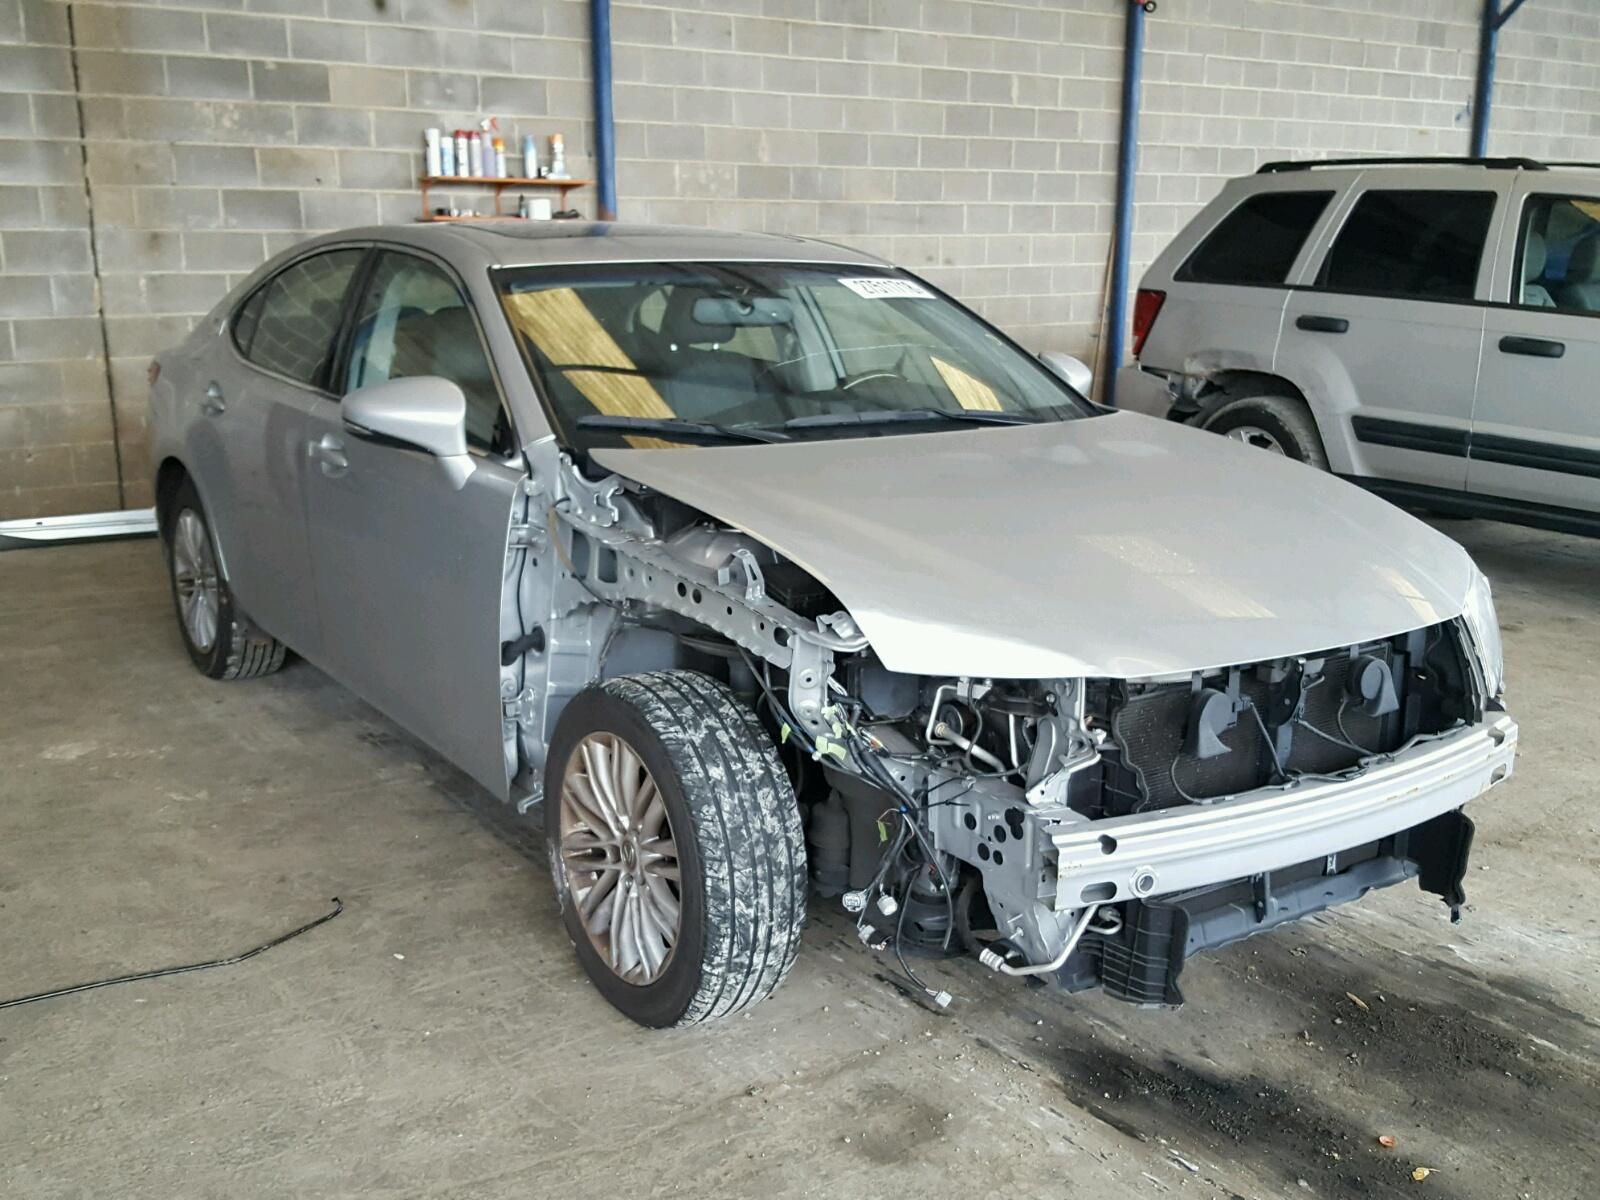 sale inventory es automotive drive car lexus ken wheel pre for front owned garff